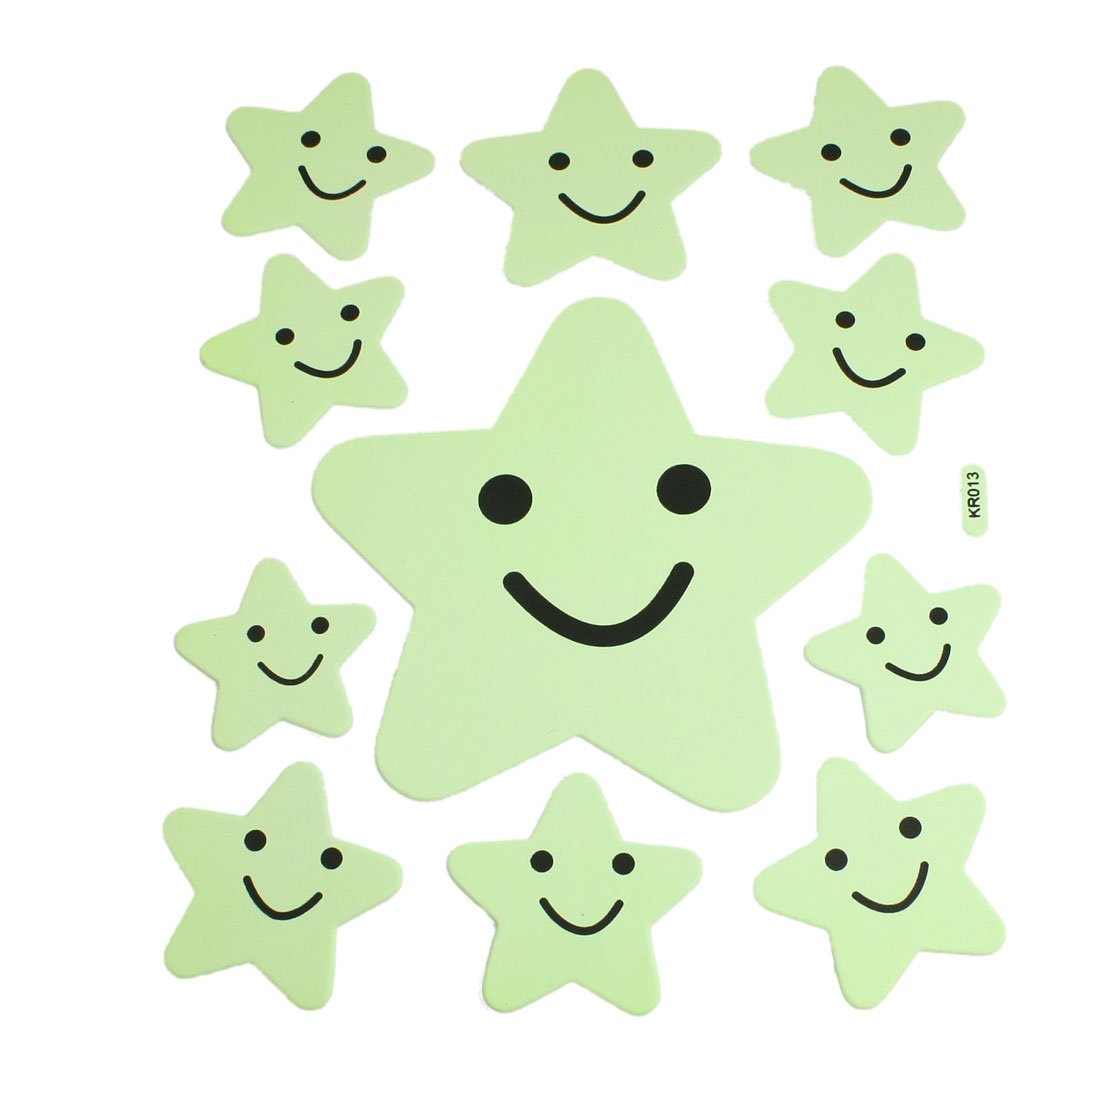 11 Pcs Light Green Black Smile Star Shape Decorative Luminous Sticker Decals